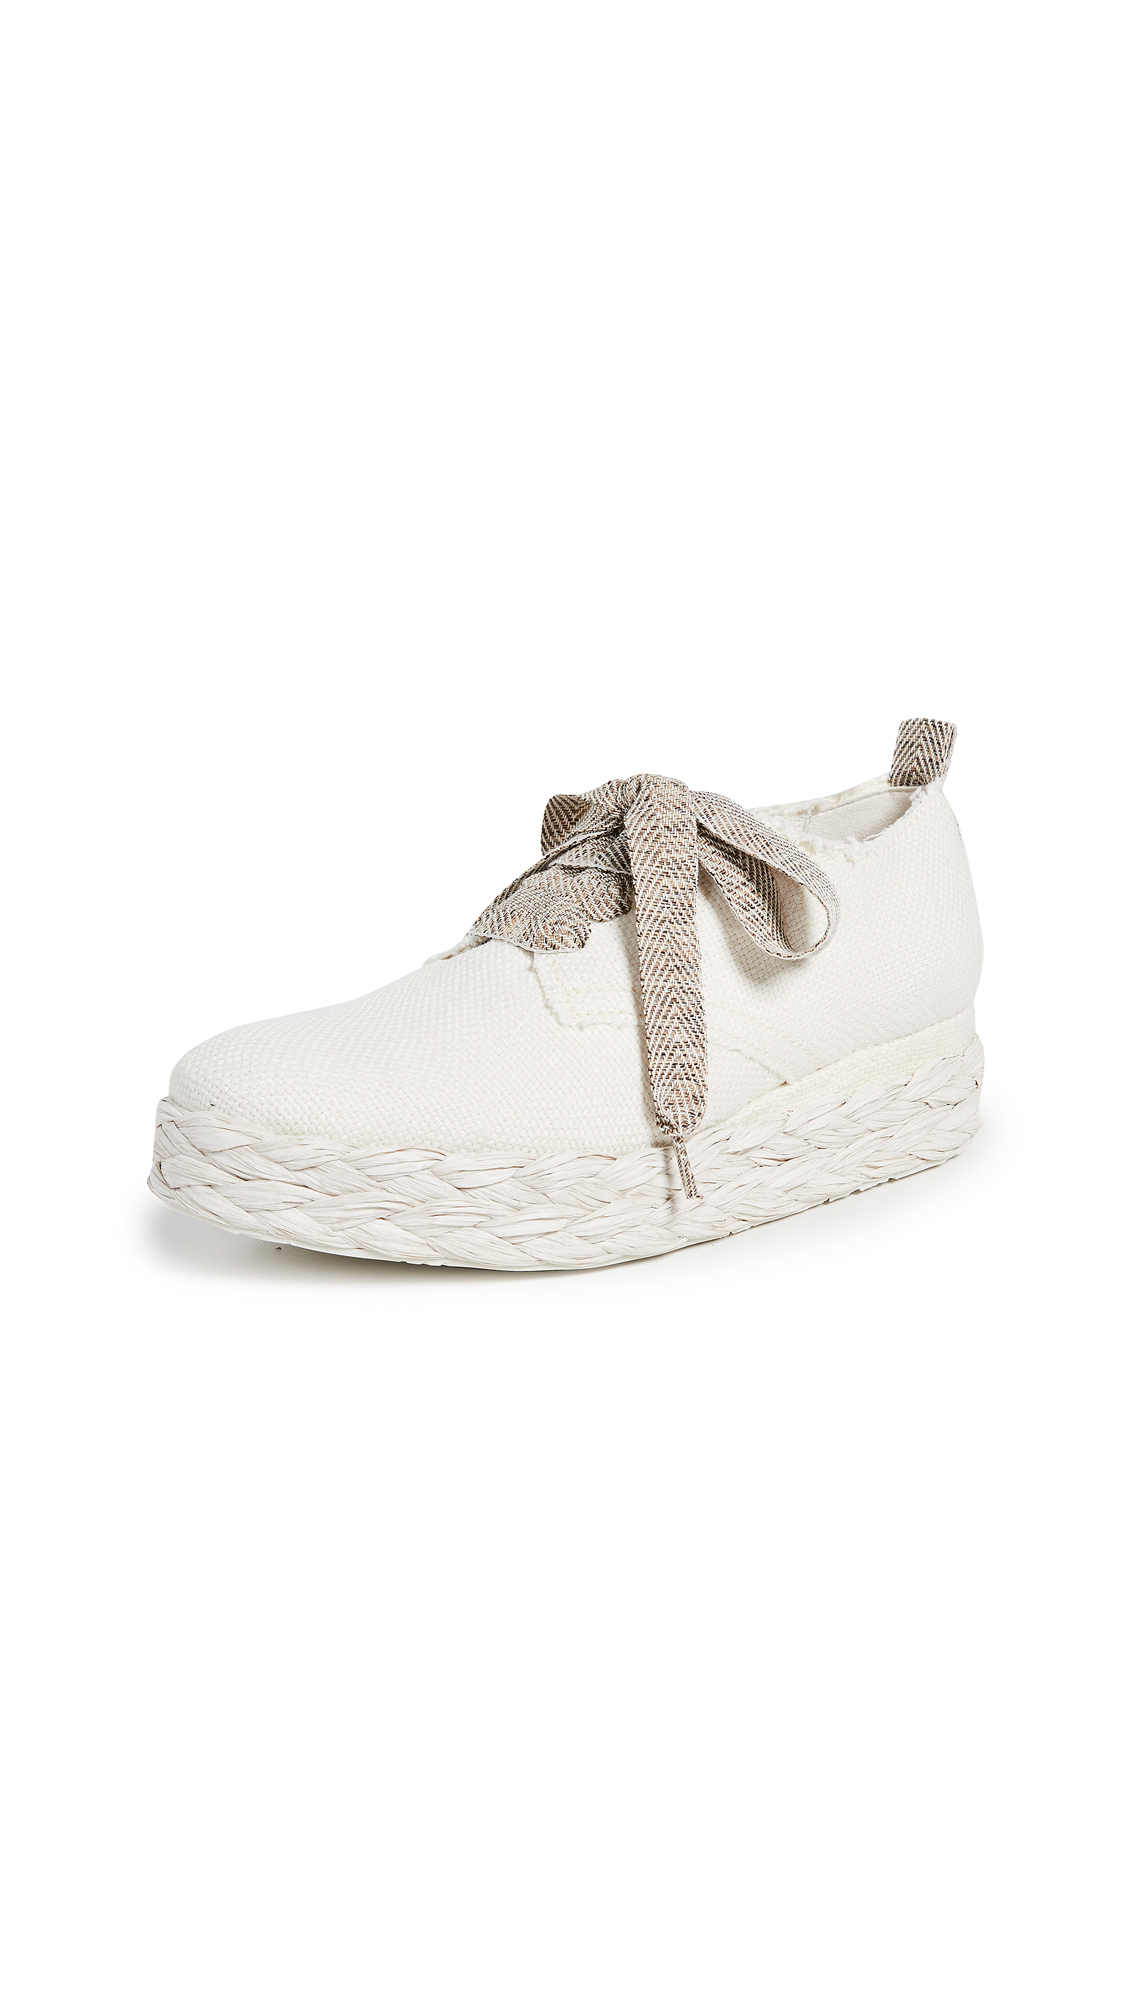 Pedro Garcia Gavi Sneakers - Vanilla